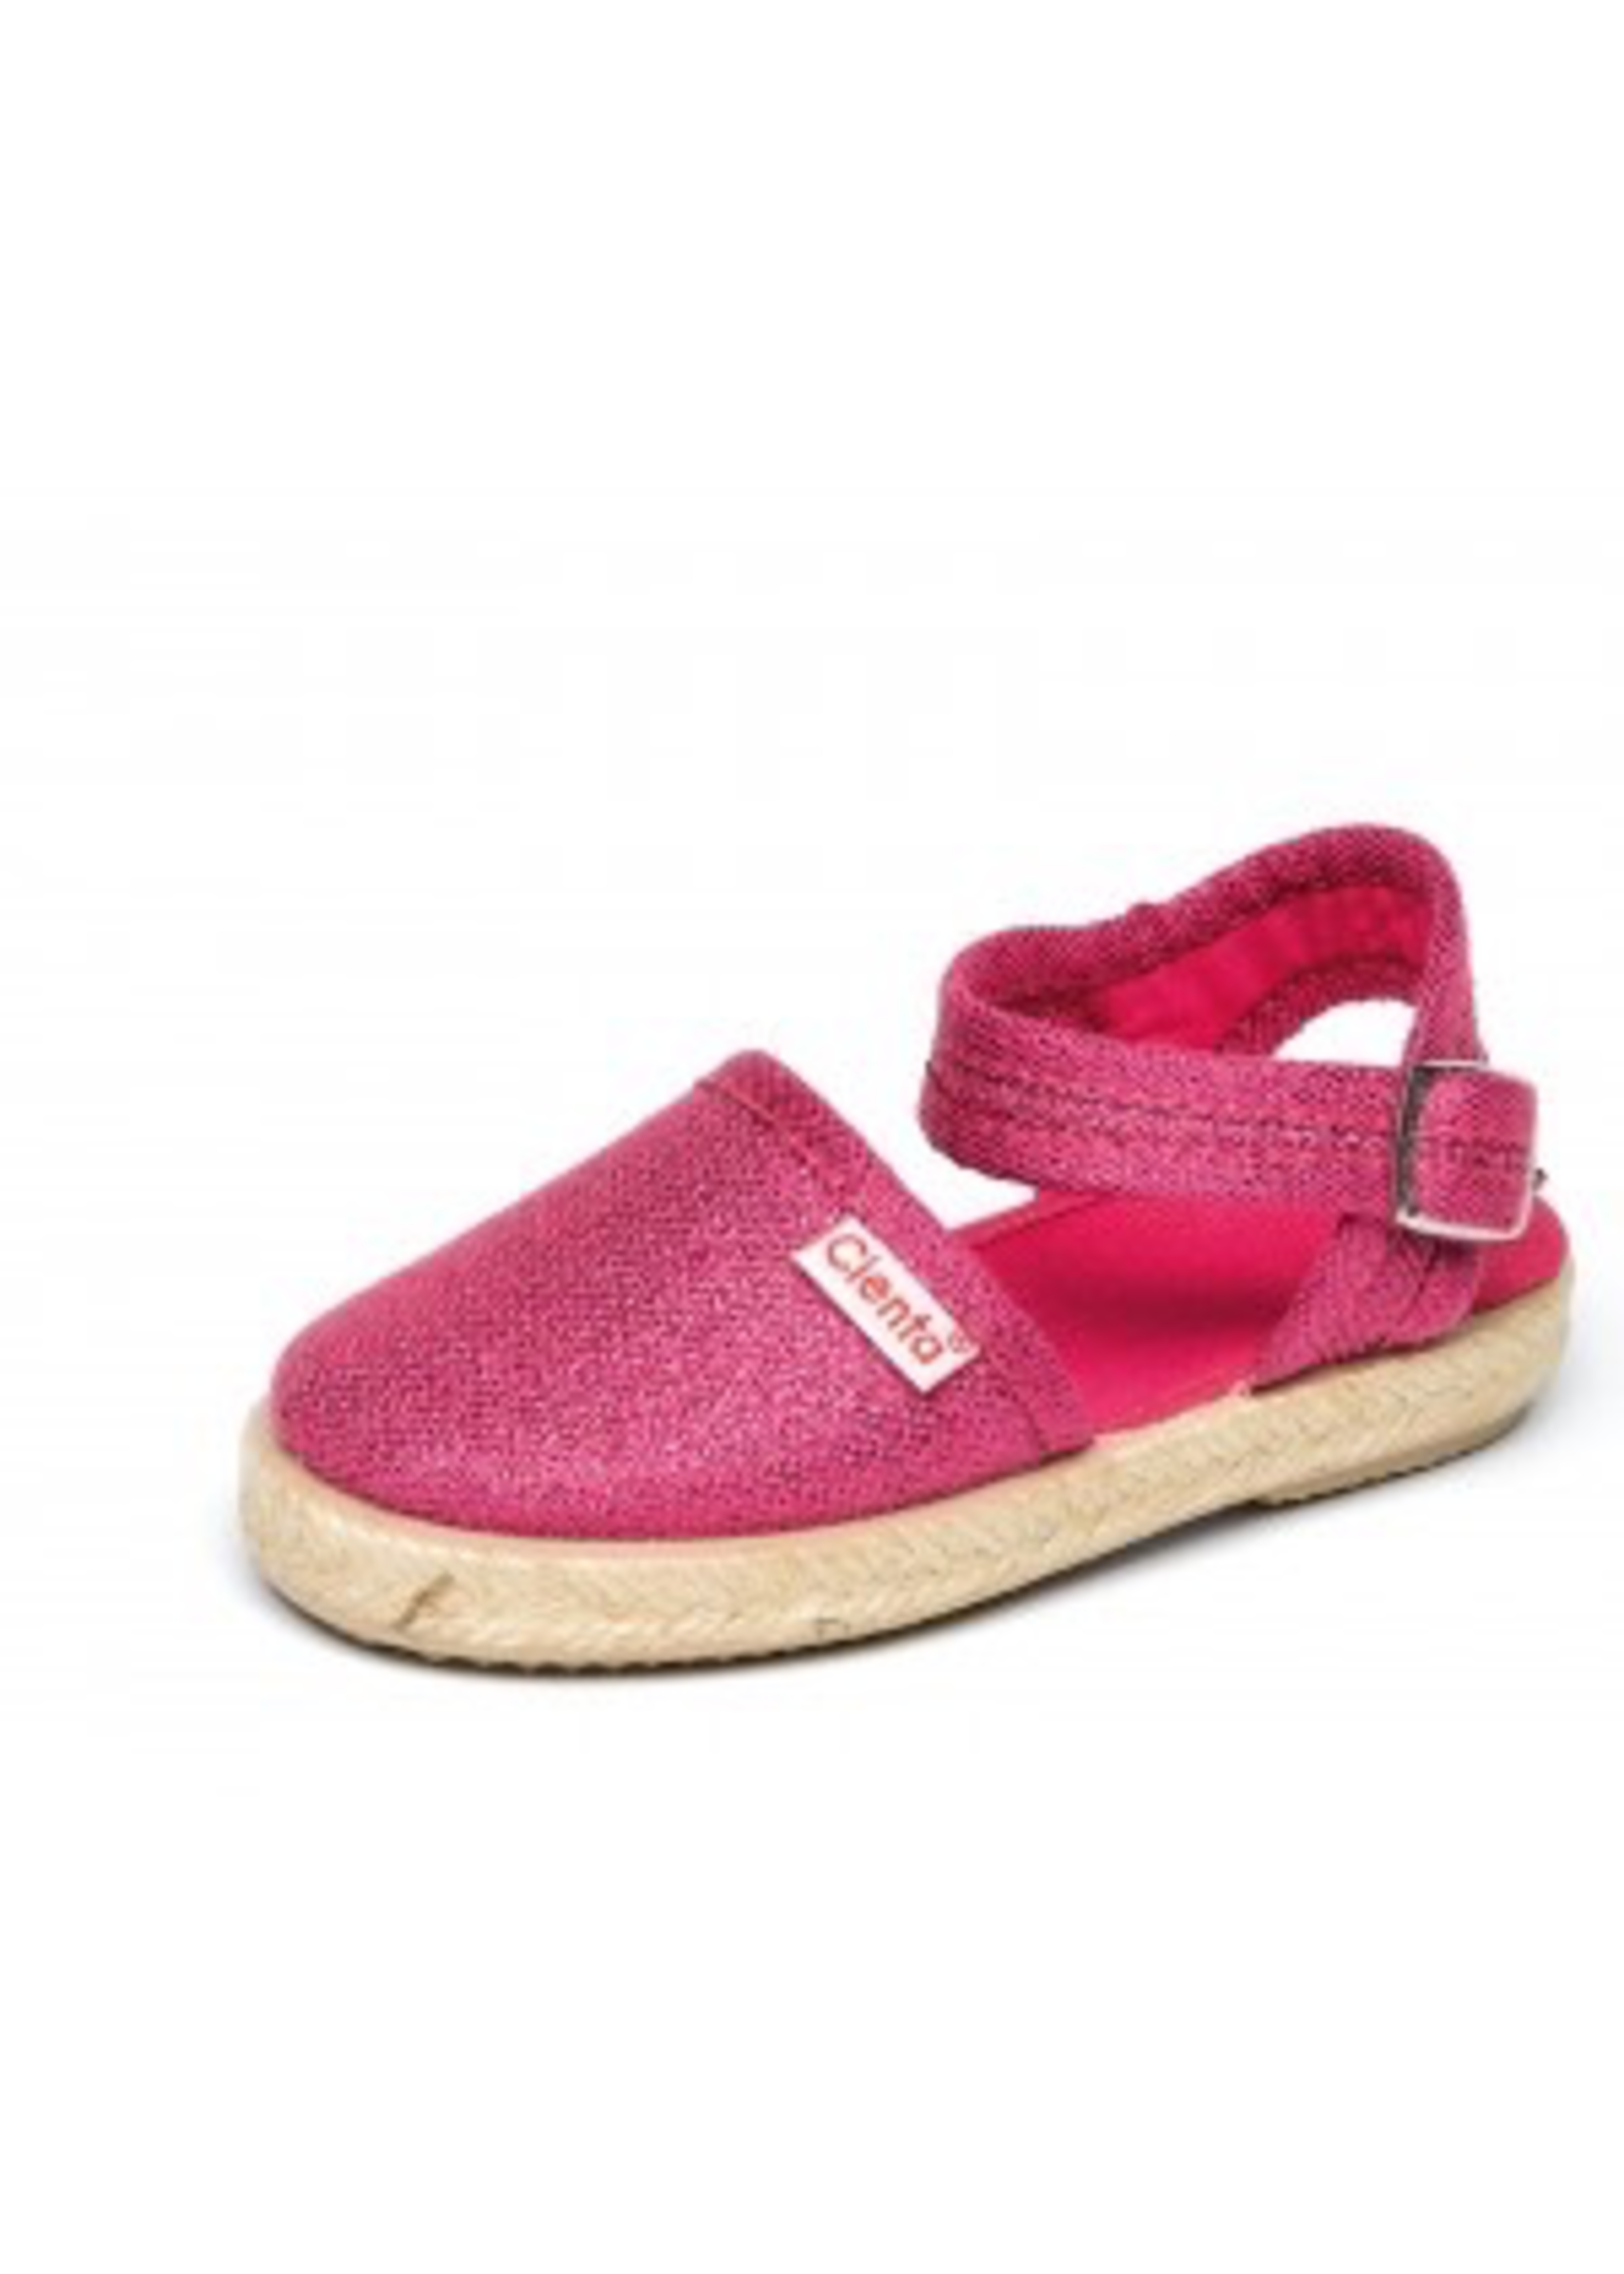 Calzados Cienta Shoes Cienta Shoes, Valenciana Hebilla Metalizado Sandal for Girl